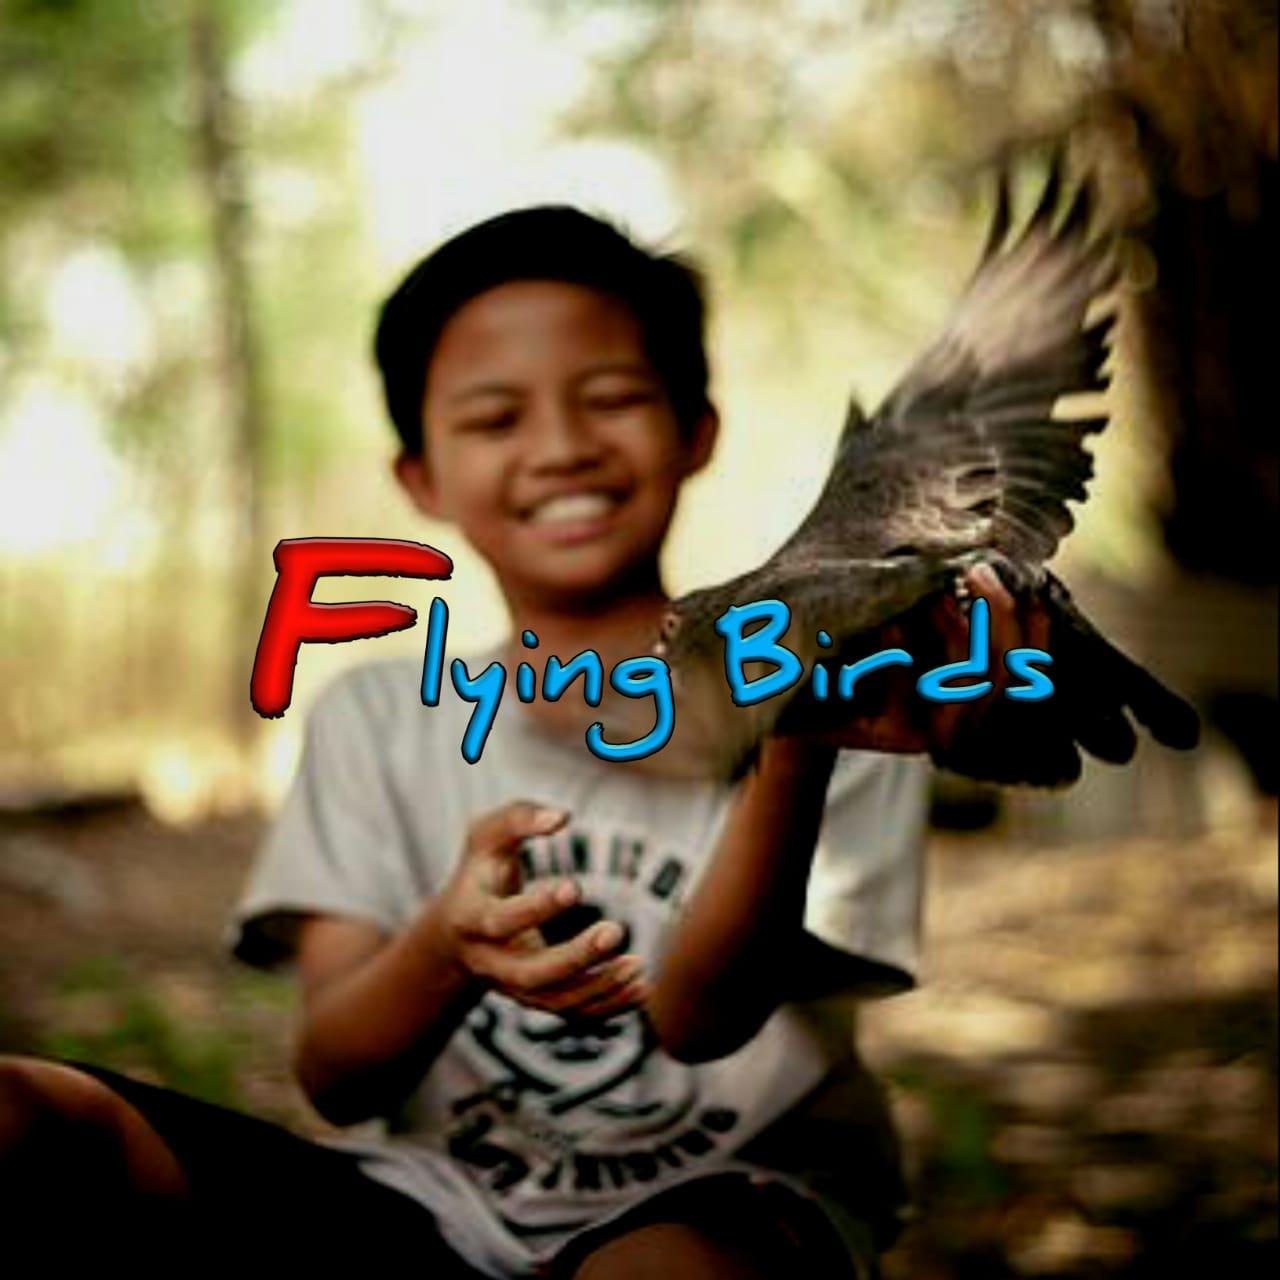 20210420_125915_Smarty-FlyingBirds.jpg